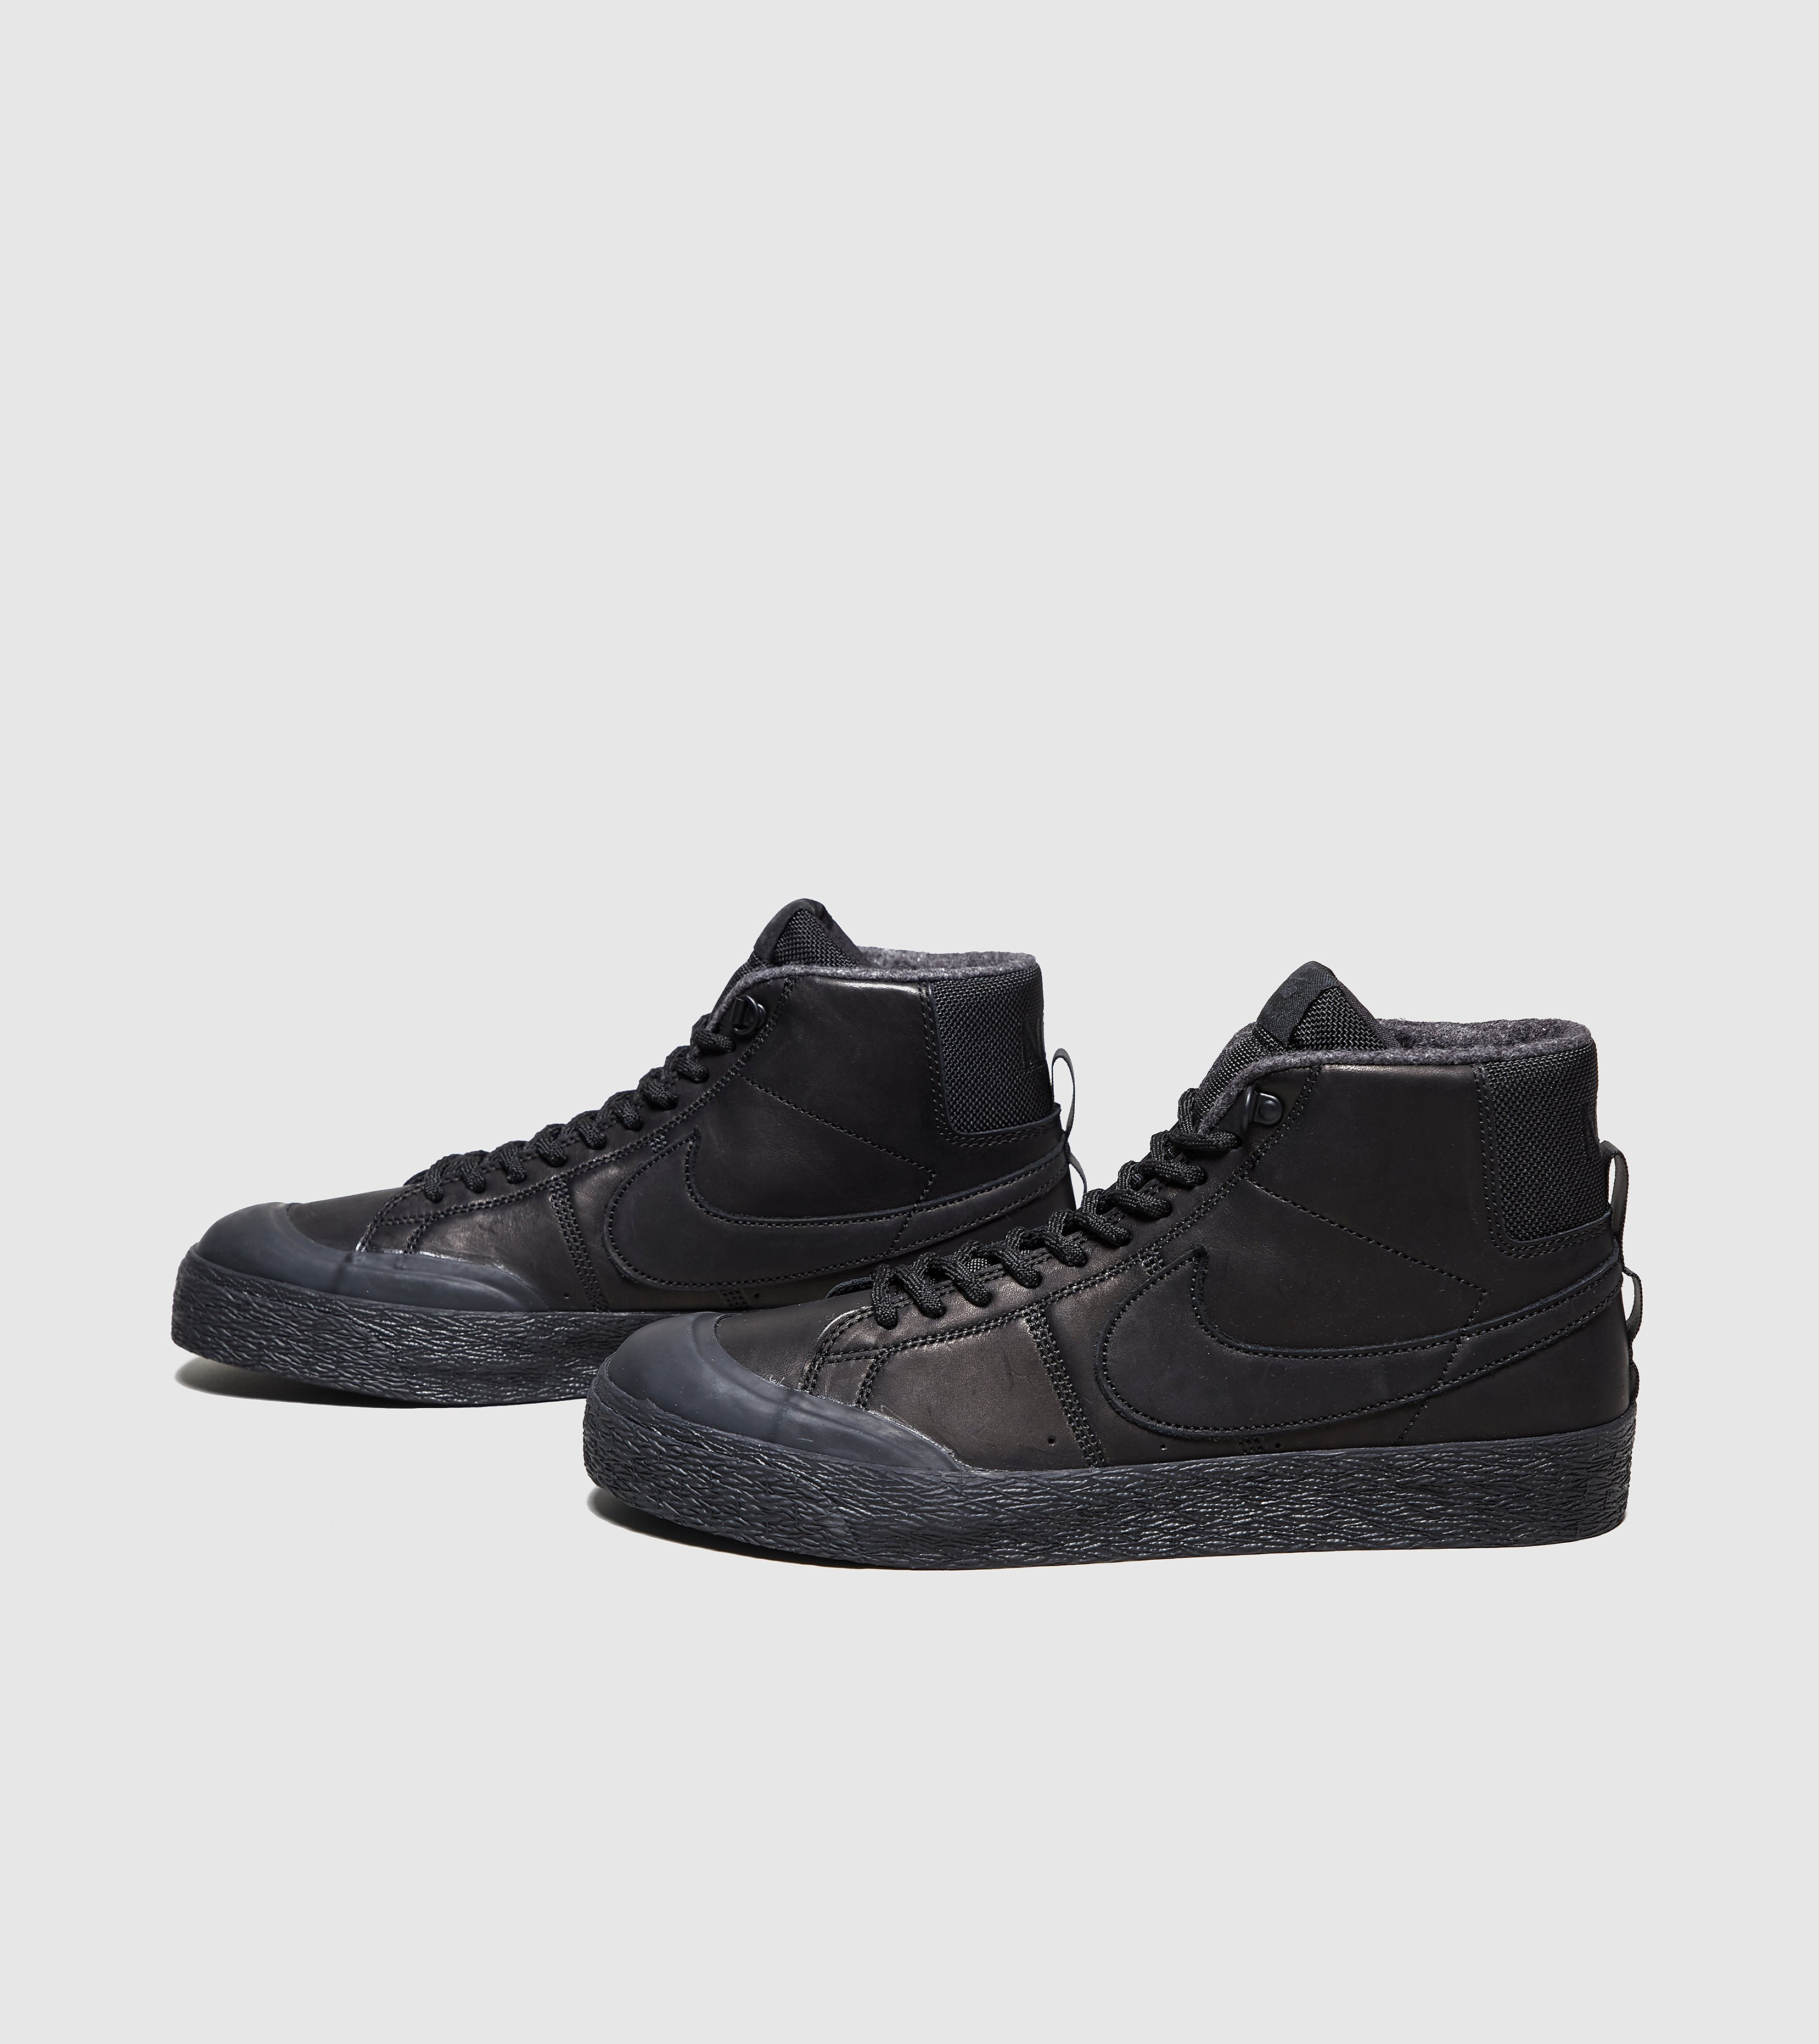 Nike SB Blazer Mid Bota